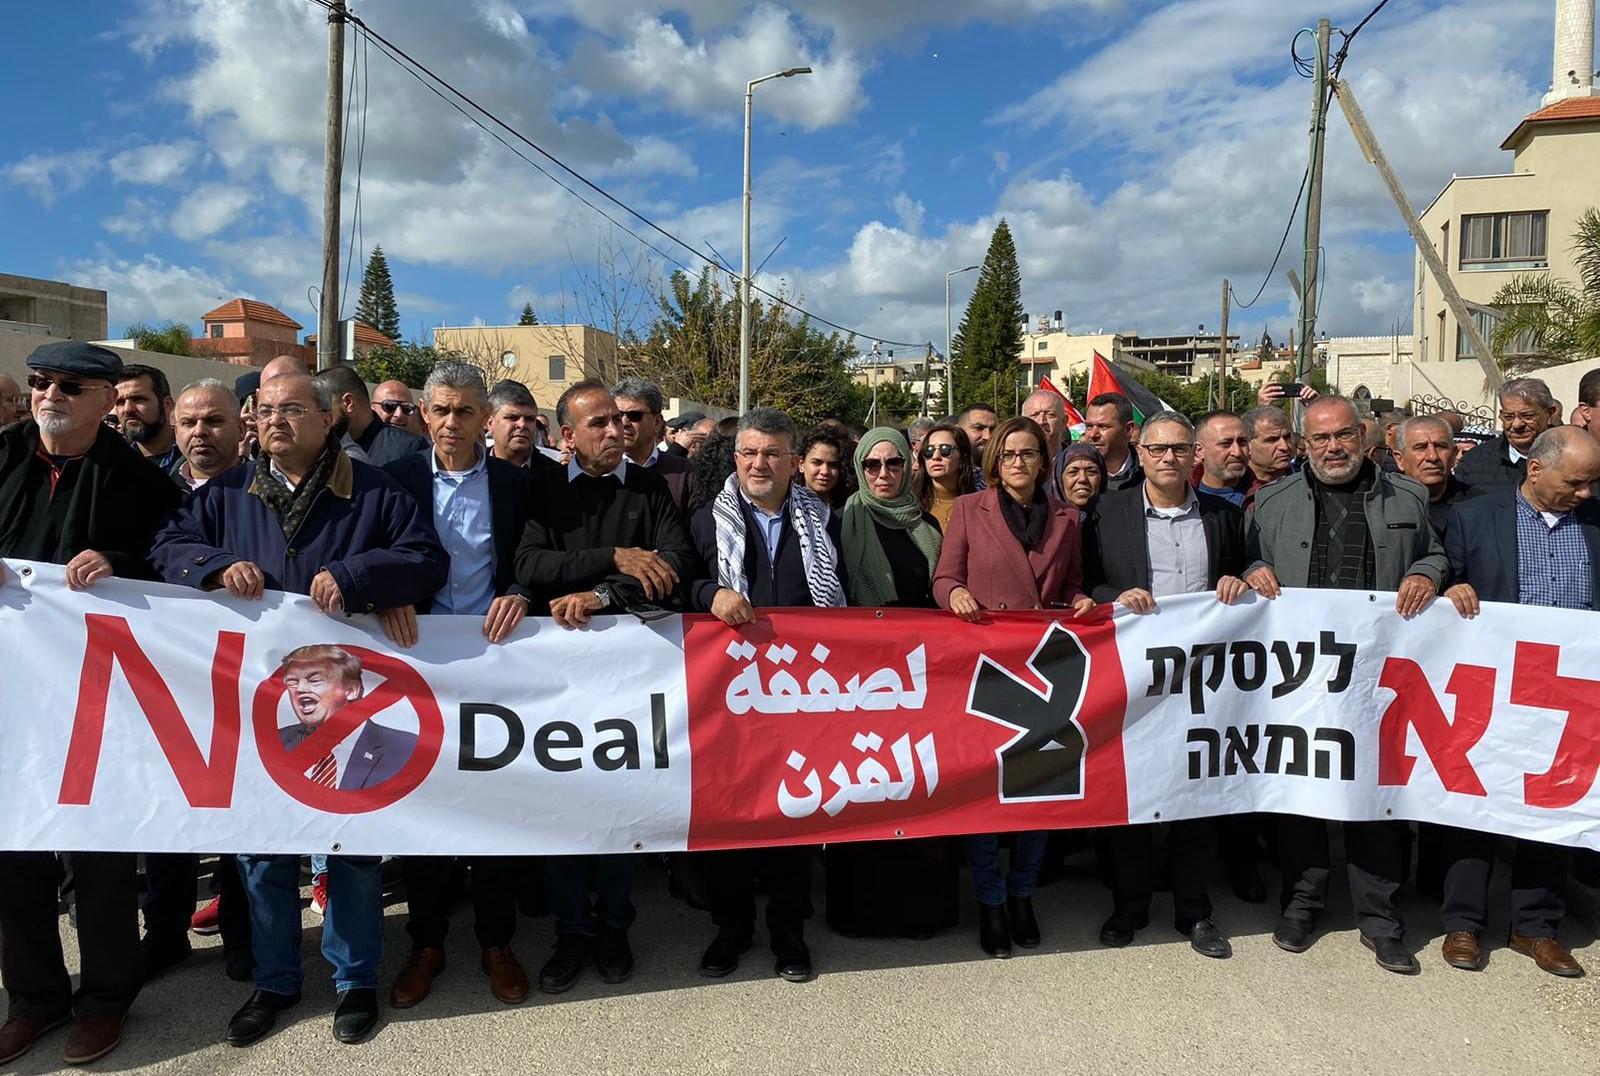 Joint List MKs lead a protest against US President Donald Trump's peace plan in Baqa al-Gharbiya on Friday, February 1, 2020